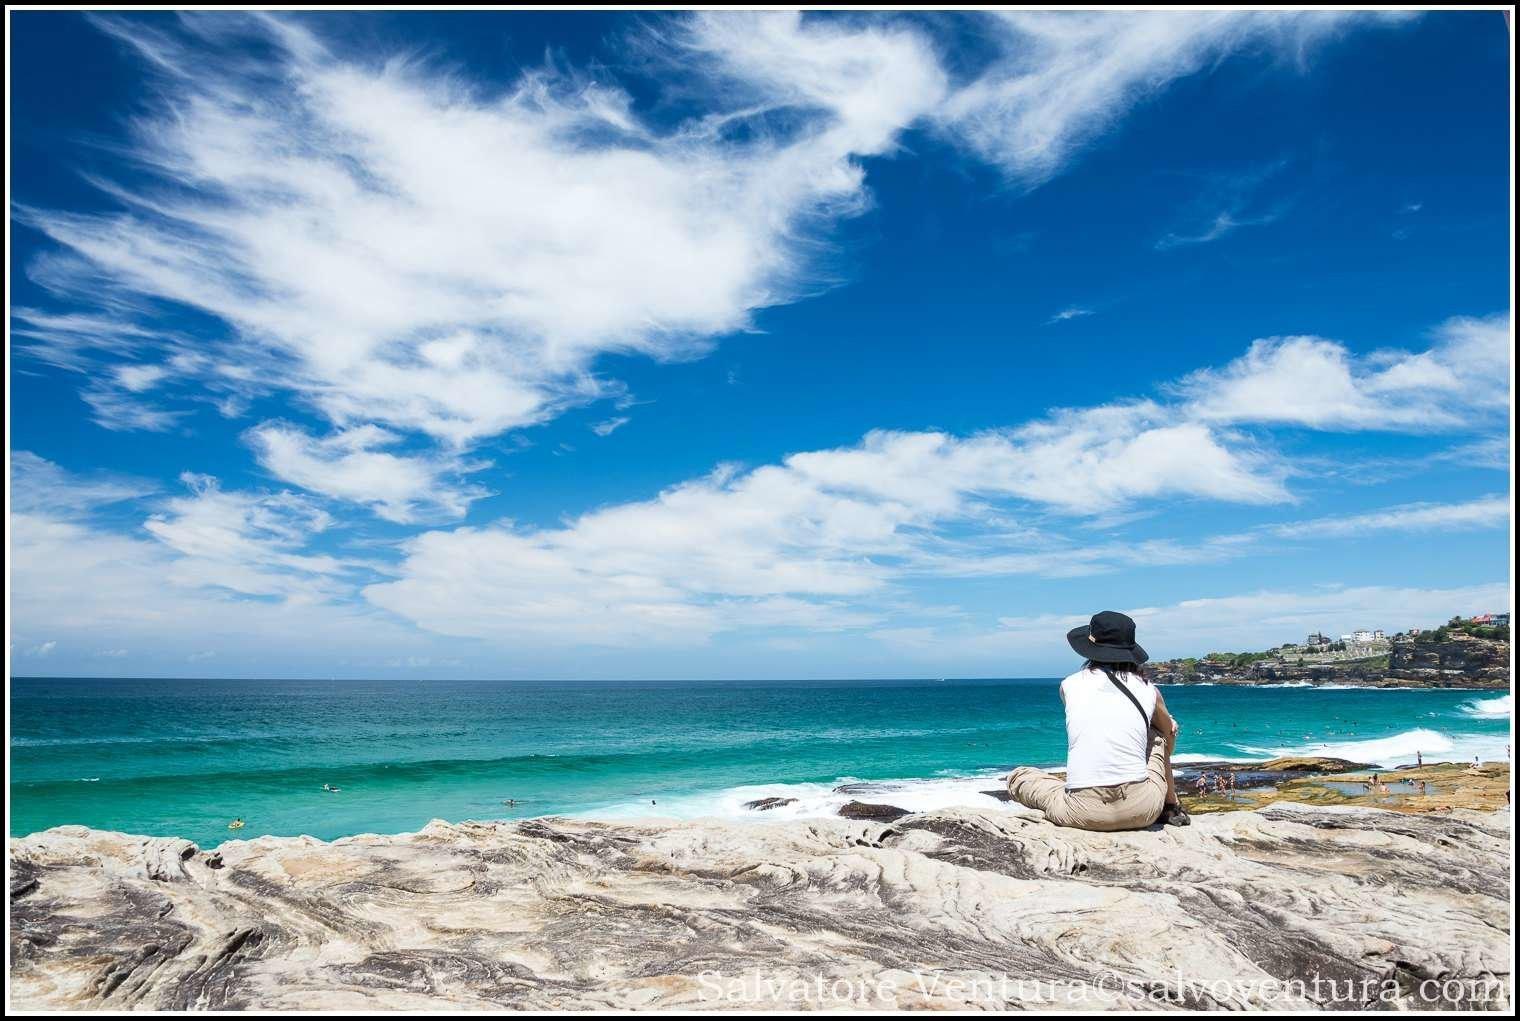 2016.03.05 Sydney Bondi to Coogee coastal hike-salvoventura-blog-DSC_6829